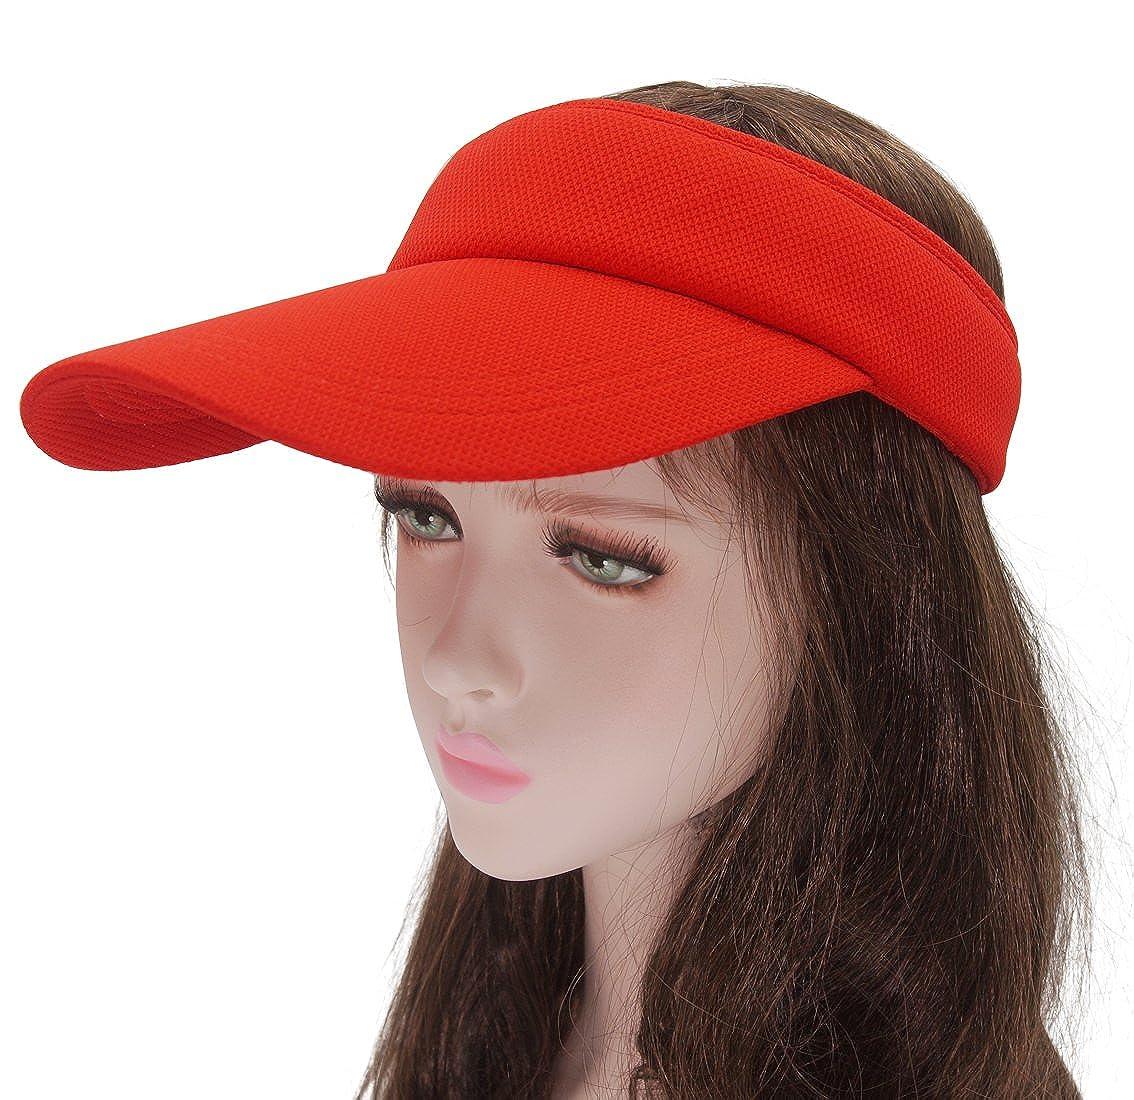 Roffatide Women's Sun Visor Men's Empty Top Summer Hat Outdoor Sports RT7002-3